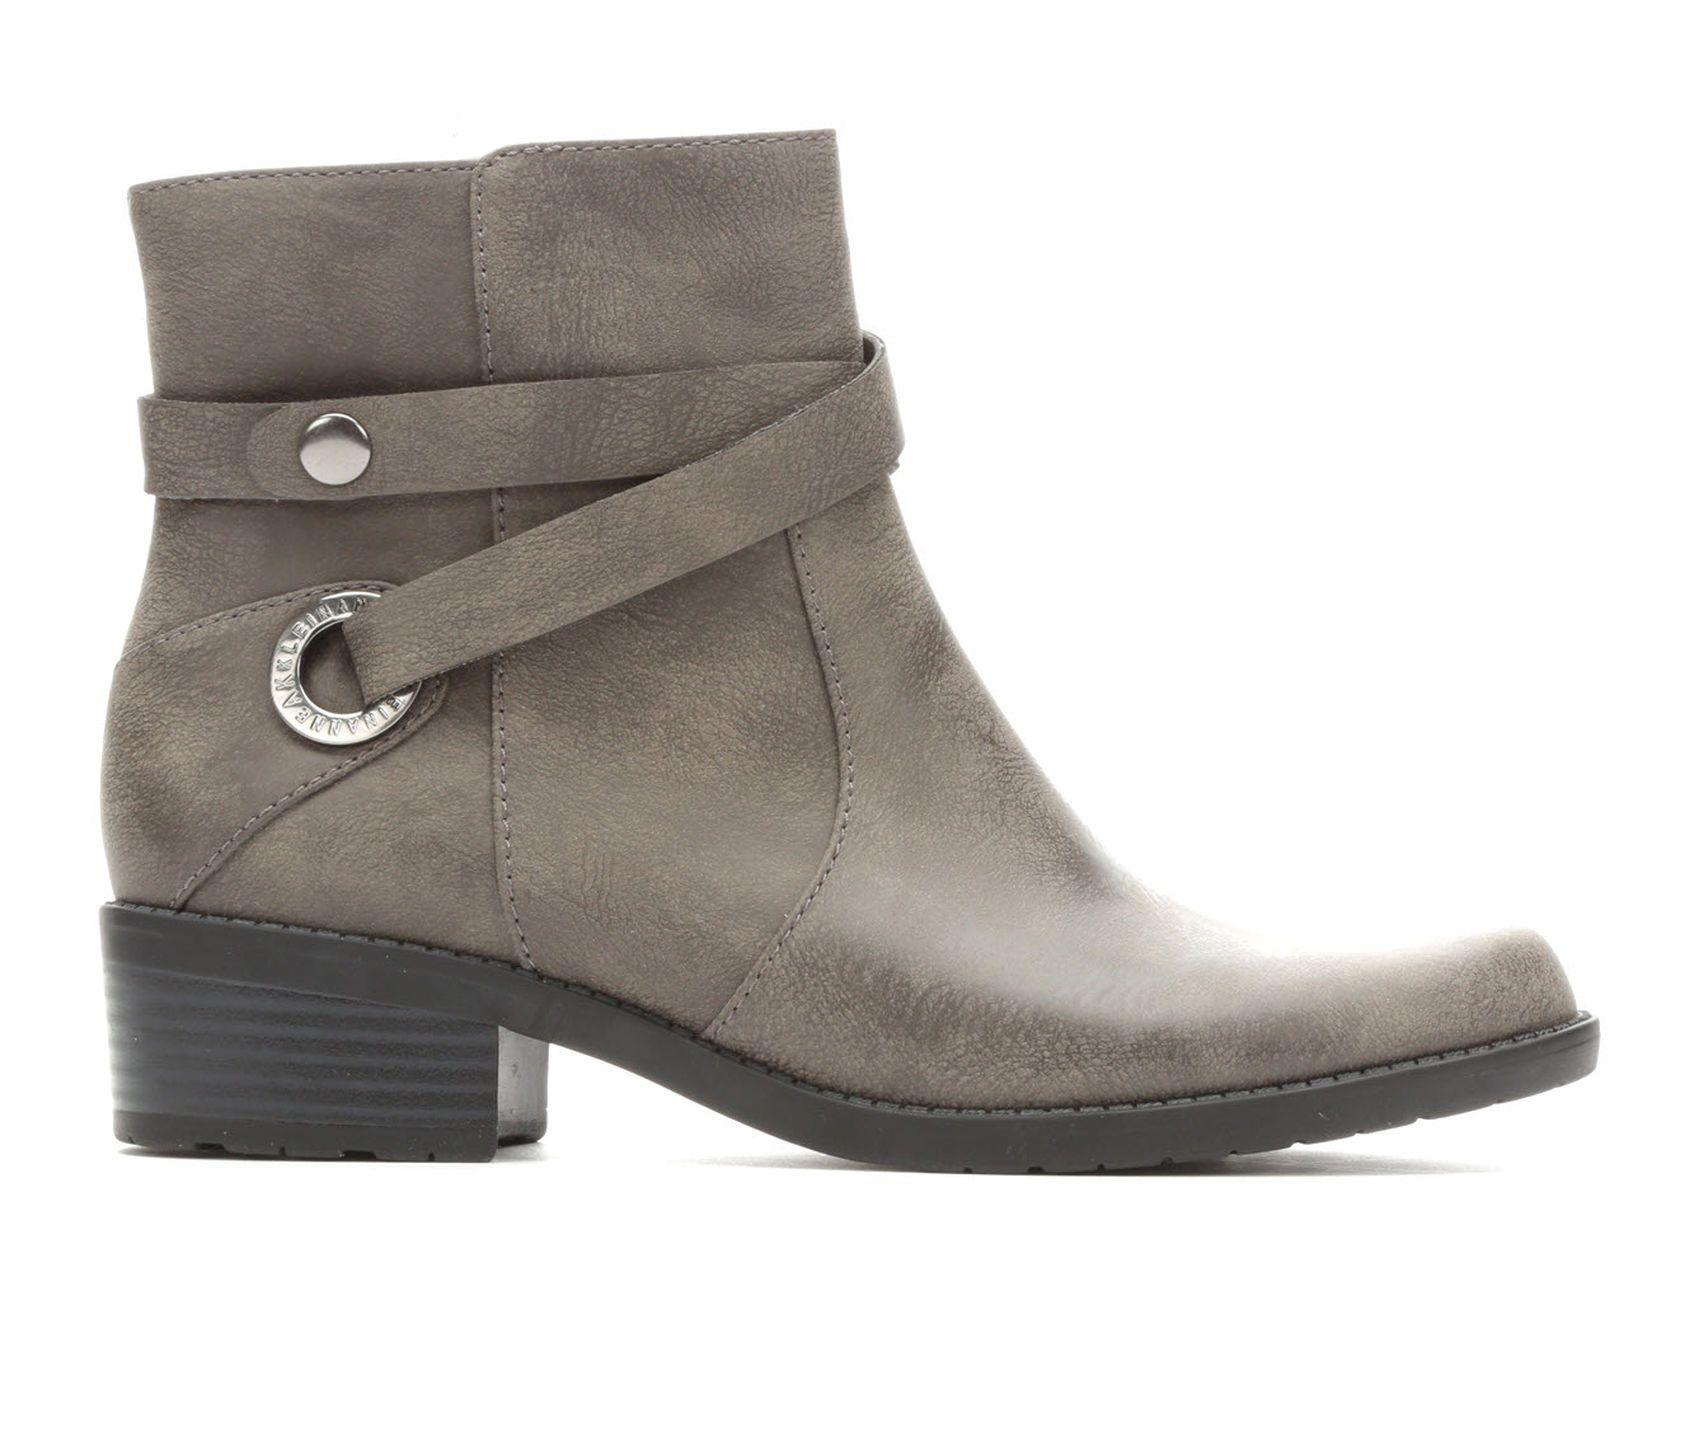 81f6764159d Women's Anne Klein Sport Libby Booties | So Many Shoes, So Little ...